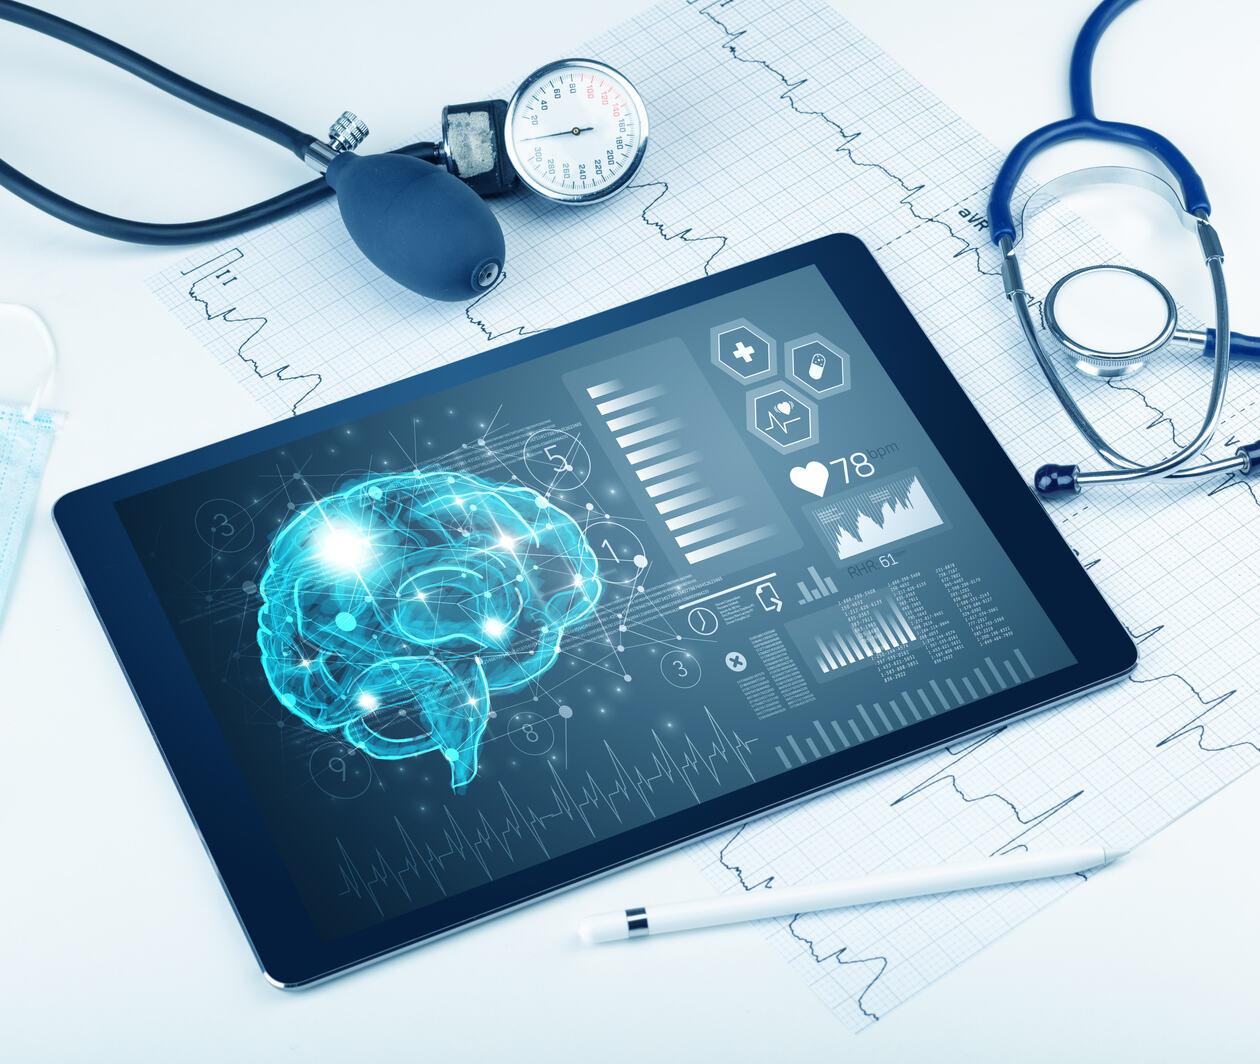 Application of Digital Health Interventions